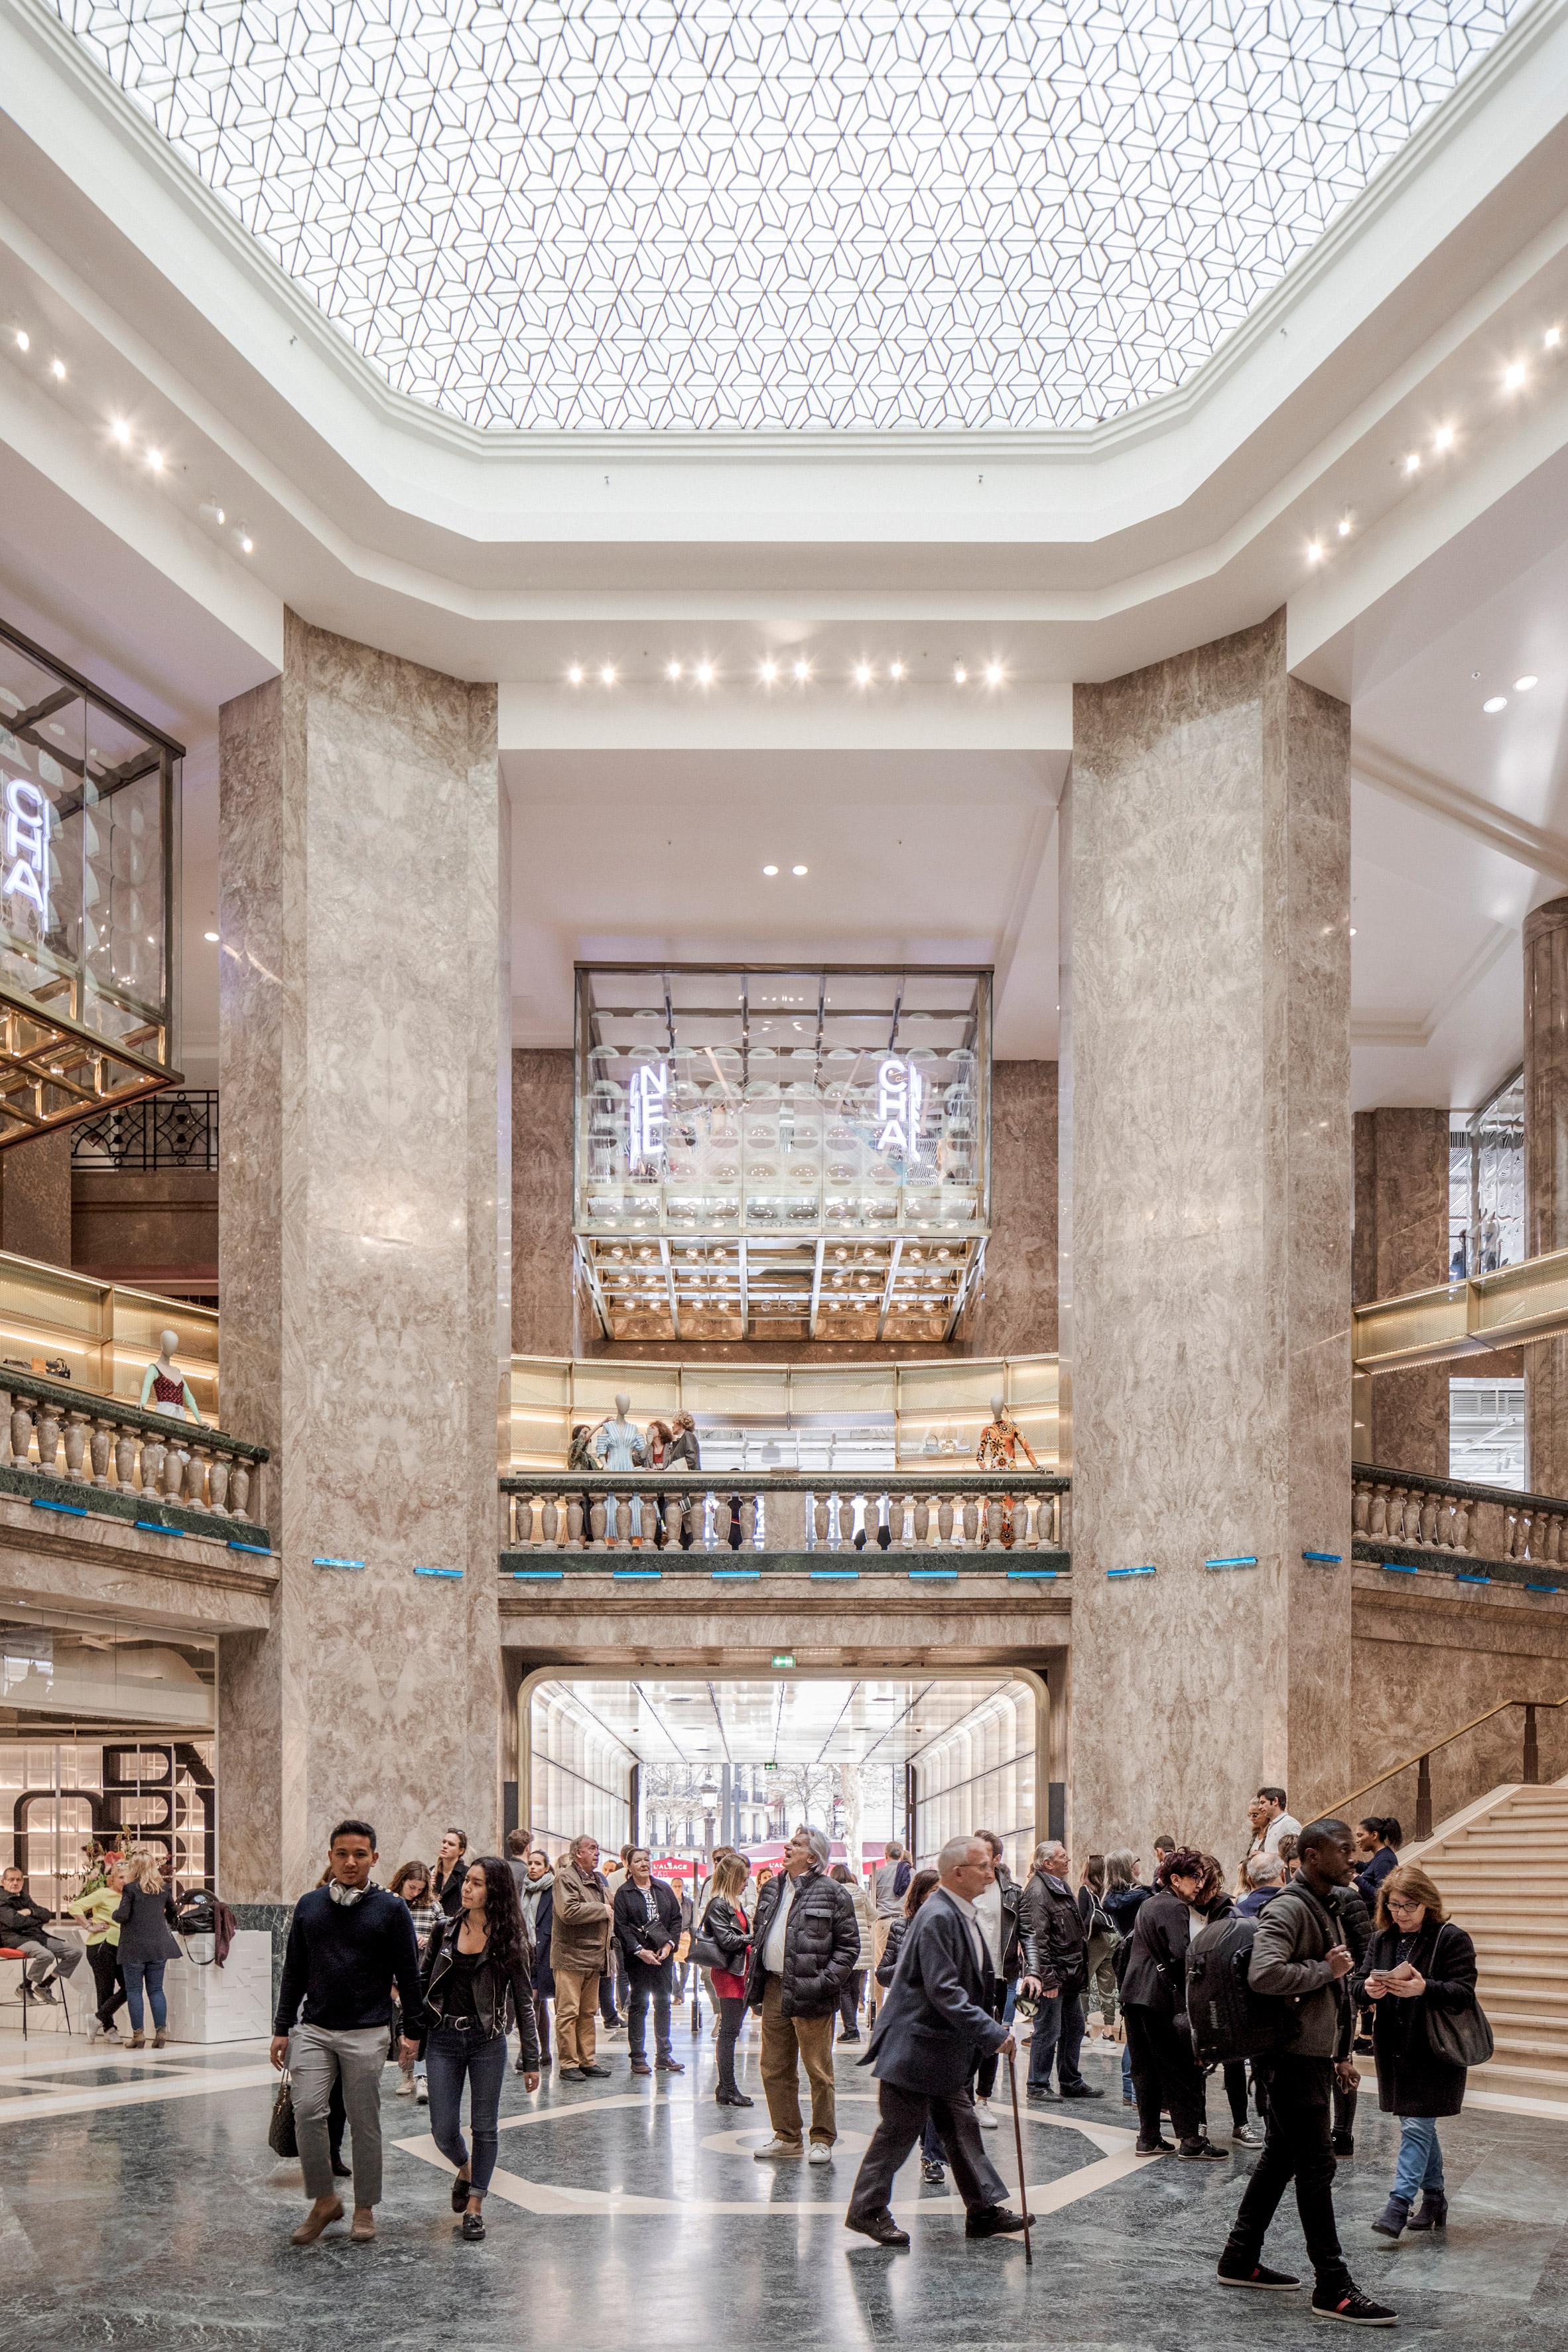 Big Completes Galeries Lafayette Store On Champs Elysees In Paris Paris Interiors Shop Interiors Champs Elysees